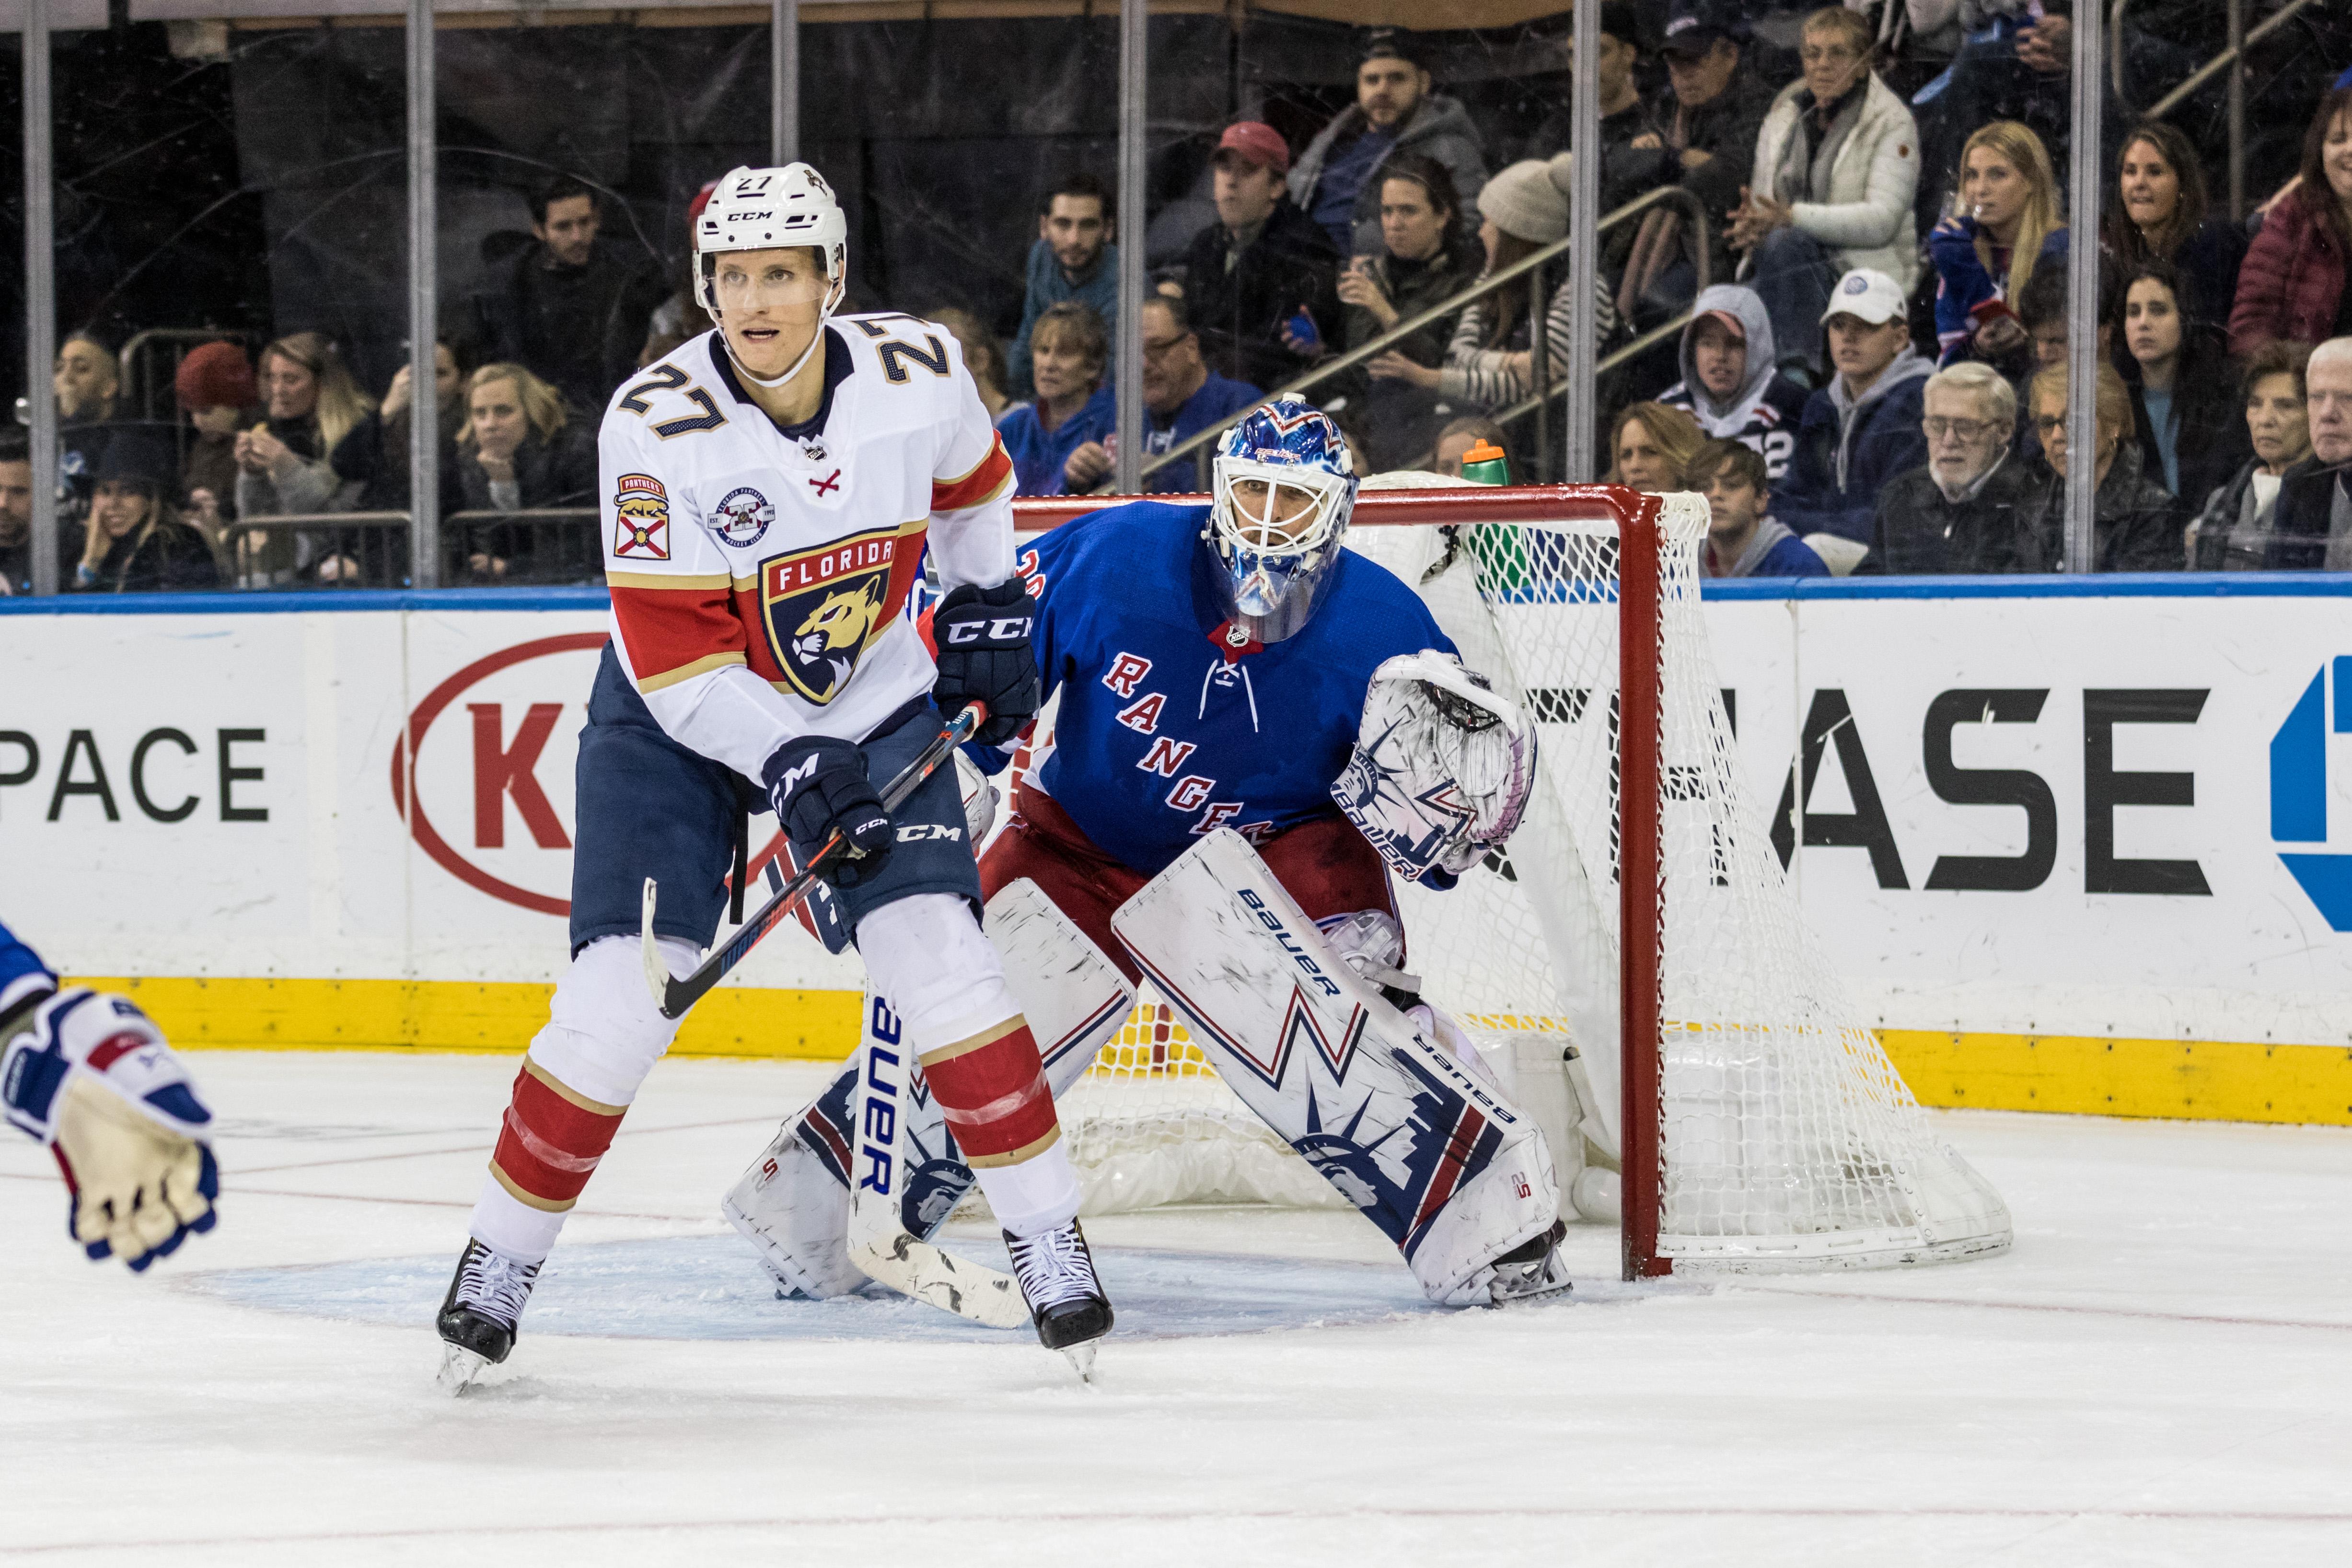 NHL: NOV 17 Panthers at Rangers